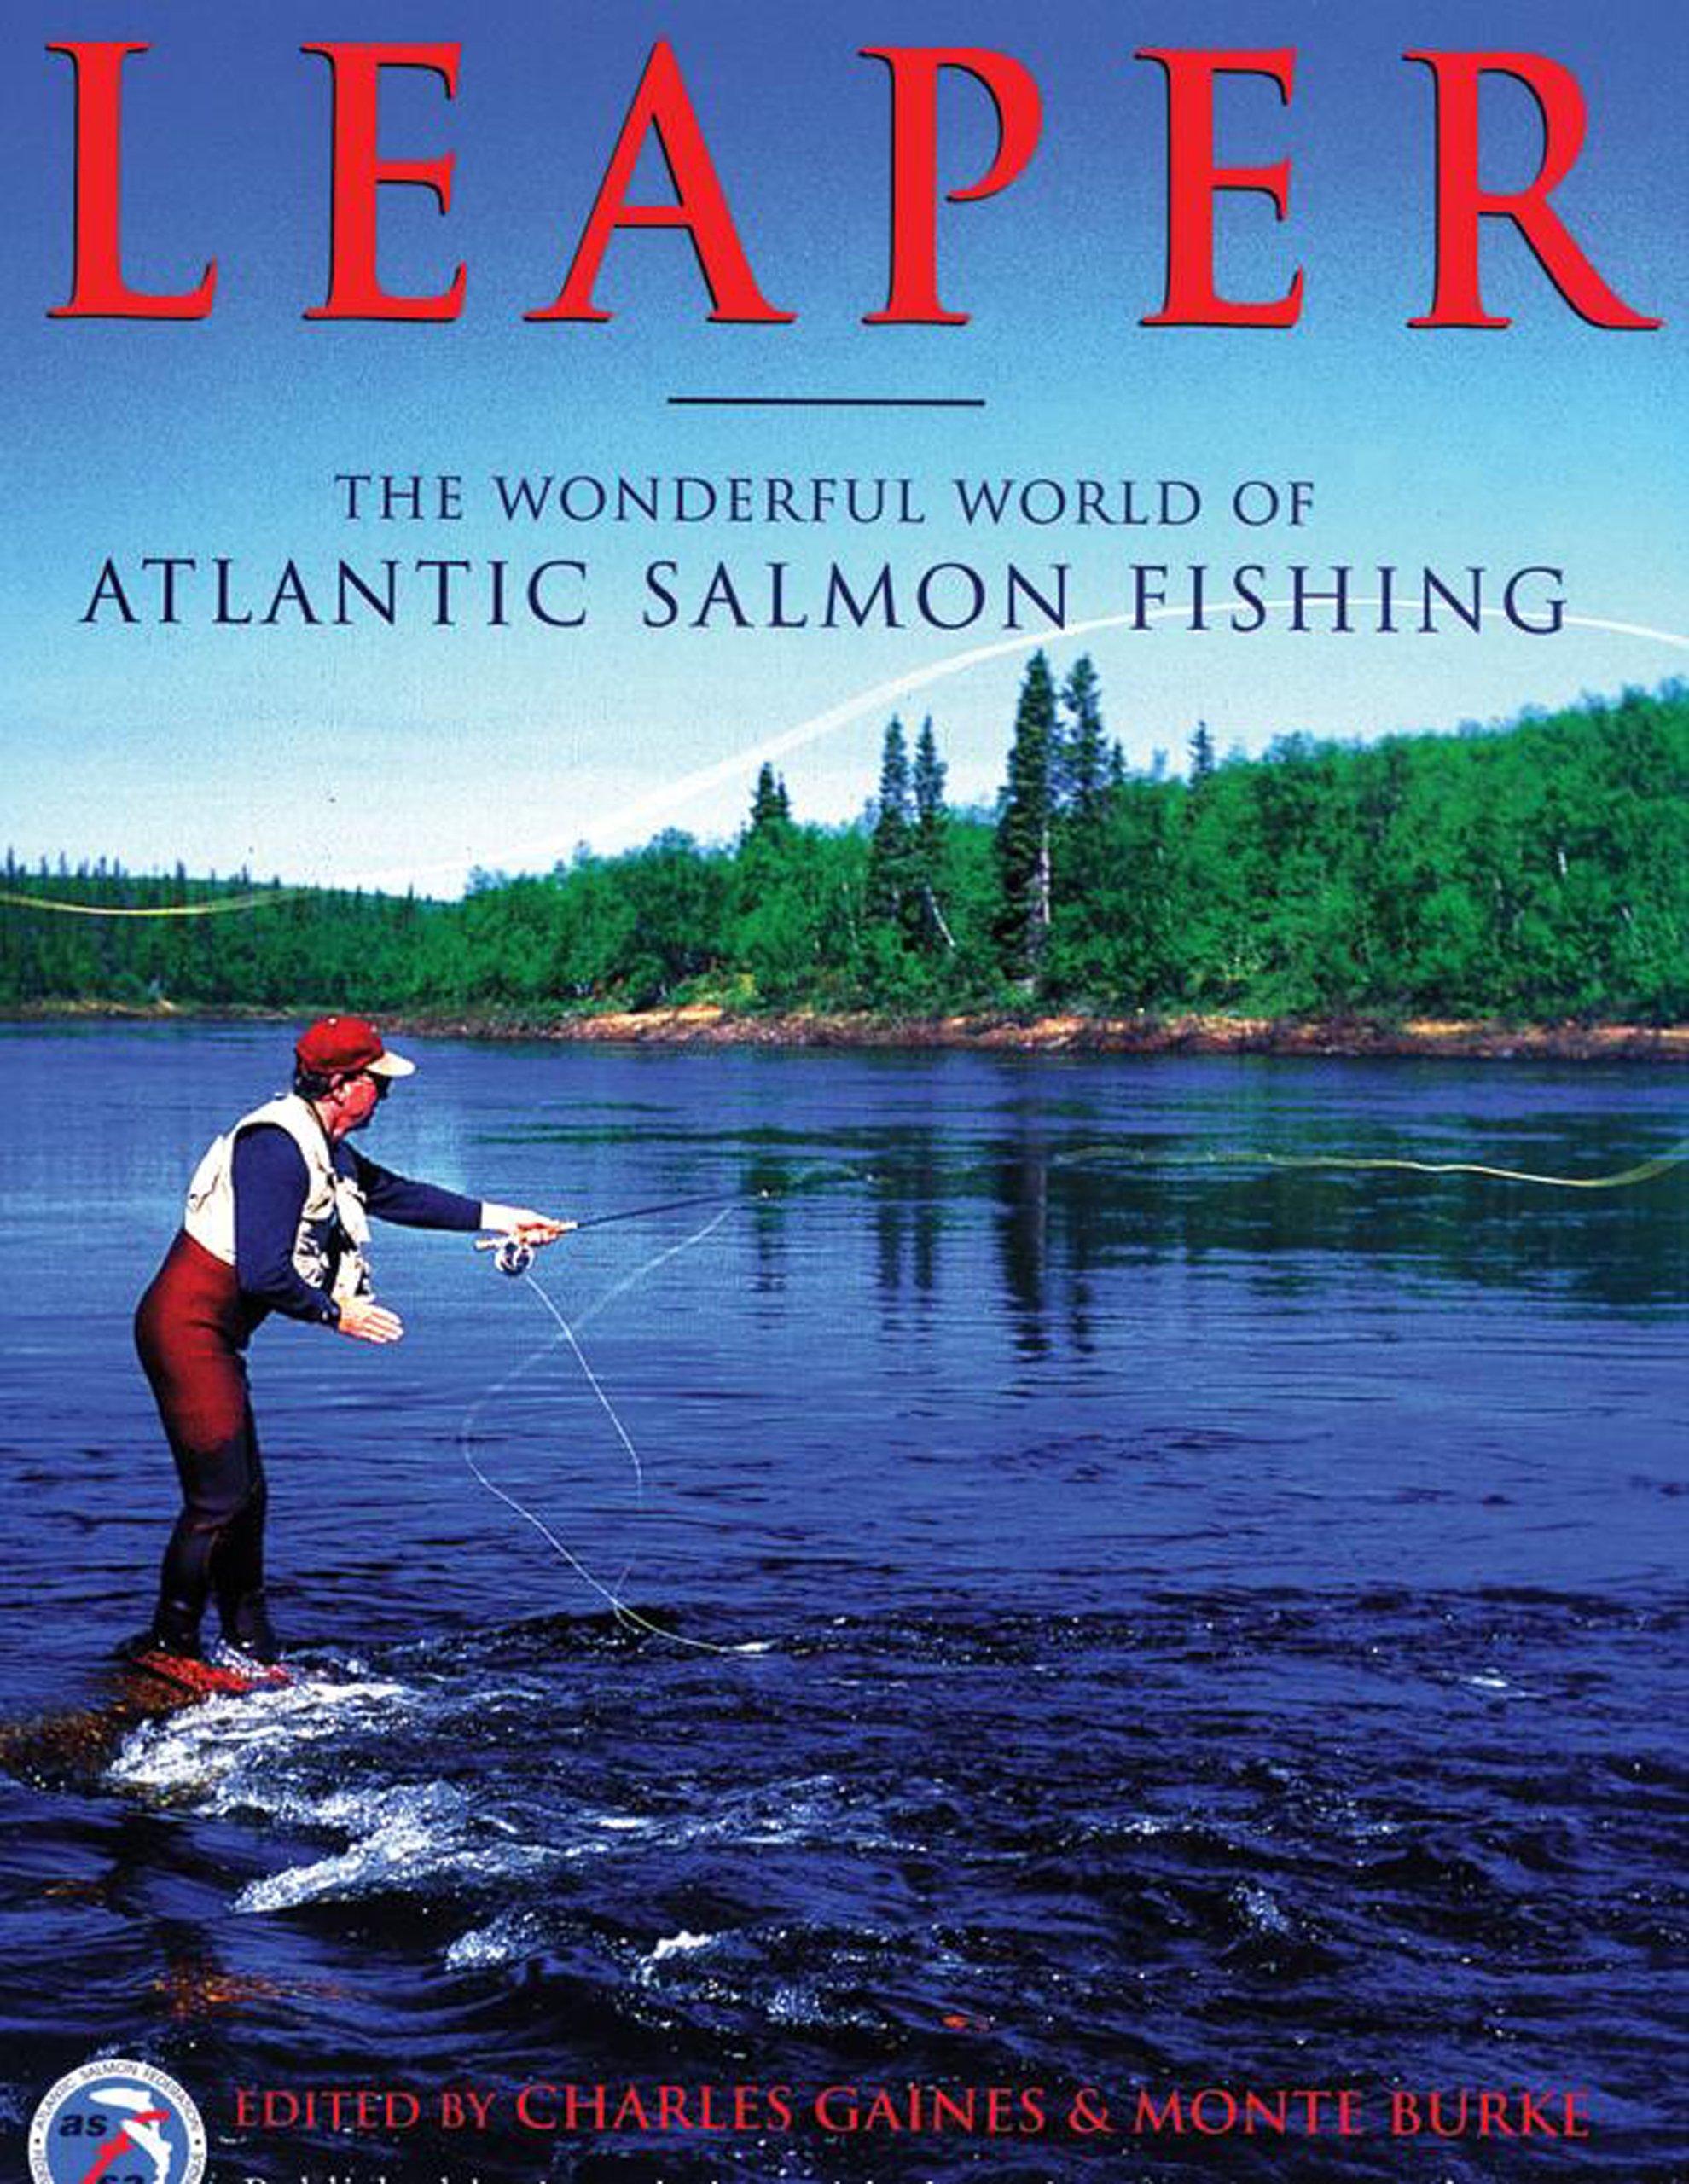 Leaper the wonderful world of atlantic salmon fishing charles leaper the wonderful world of atlantic salmon fishing charles gaines monte burke 9781585743858 amazon books fandeluxe Choice Image